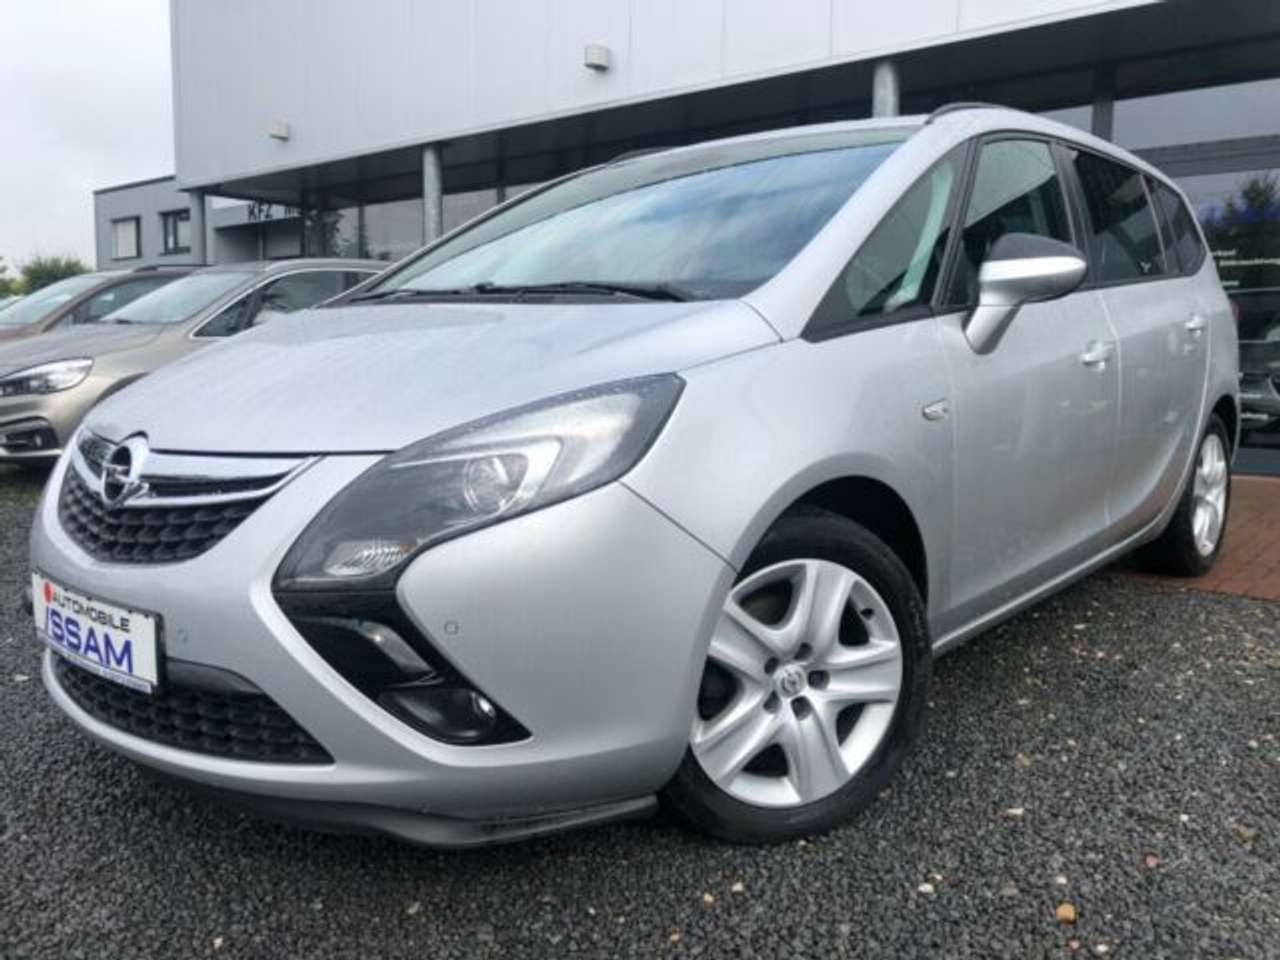 Autos nach Opel Zafira Tourer 1.4 Turbo